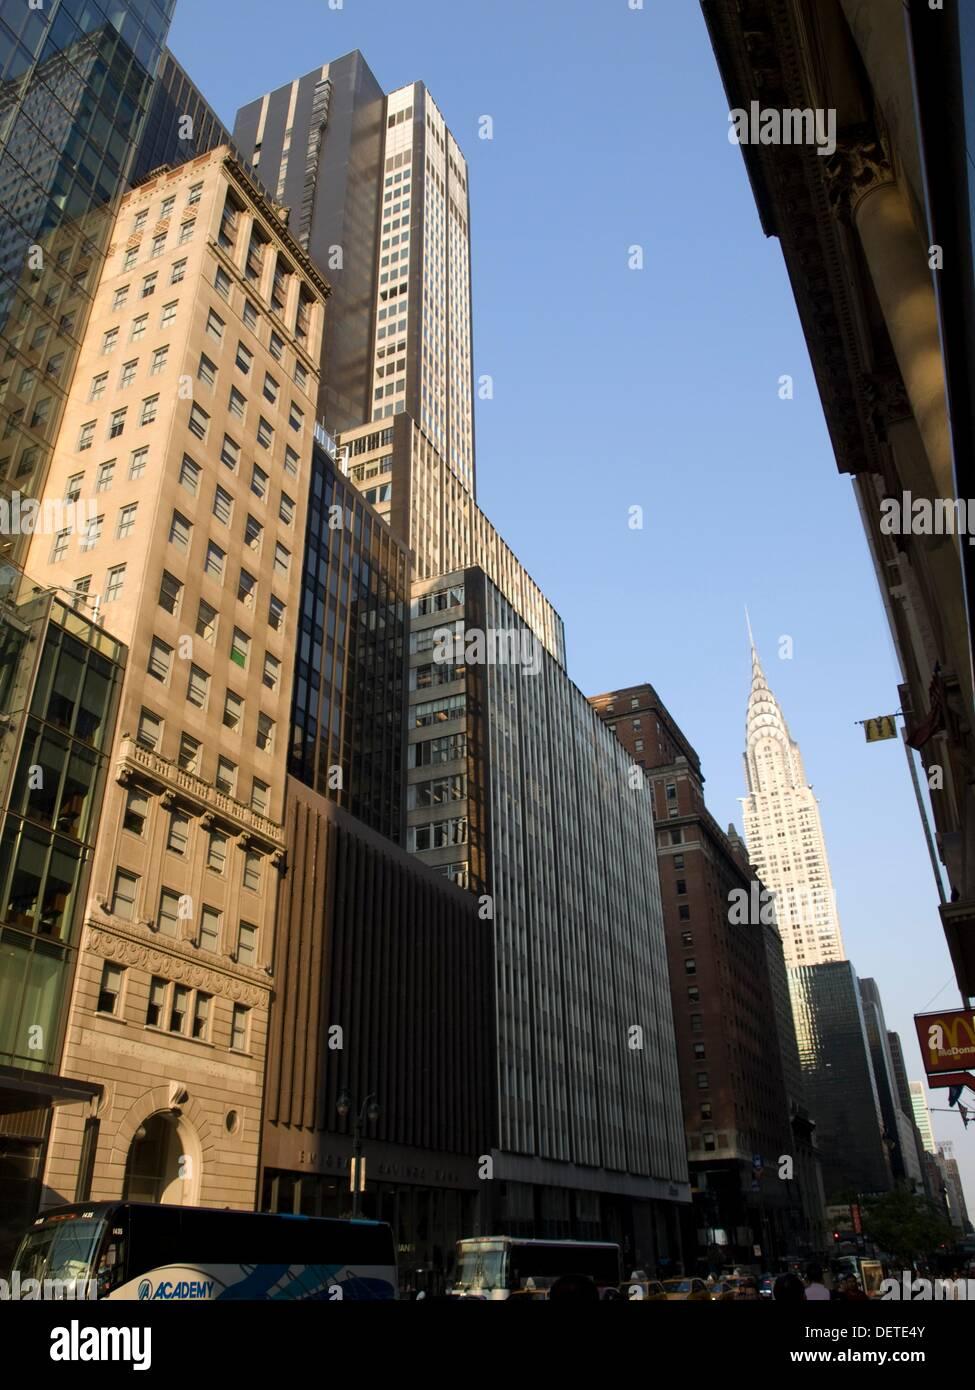 42nd Street and Chrysler Building, Manhattan, New York, USA - Stock Image